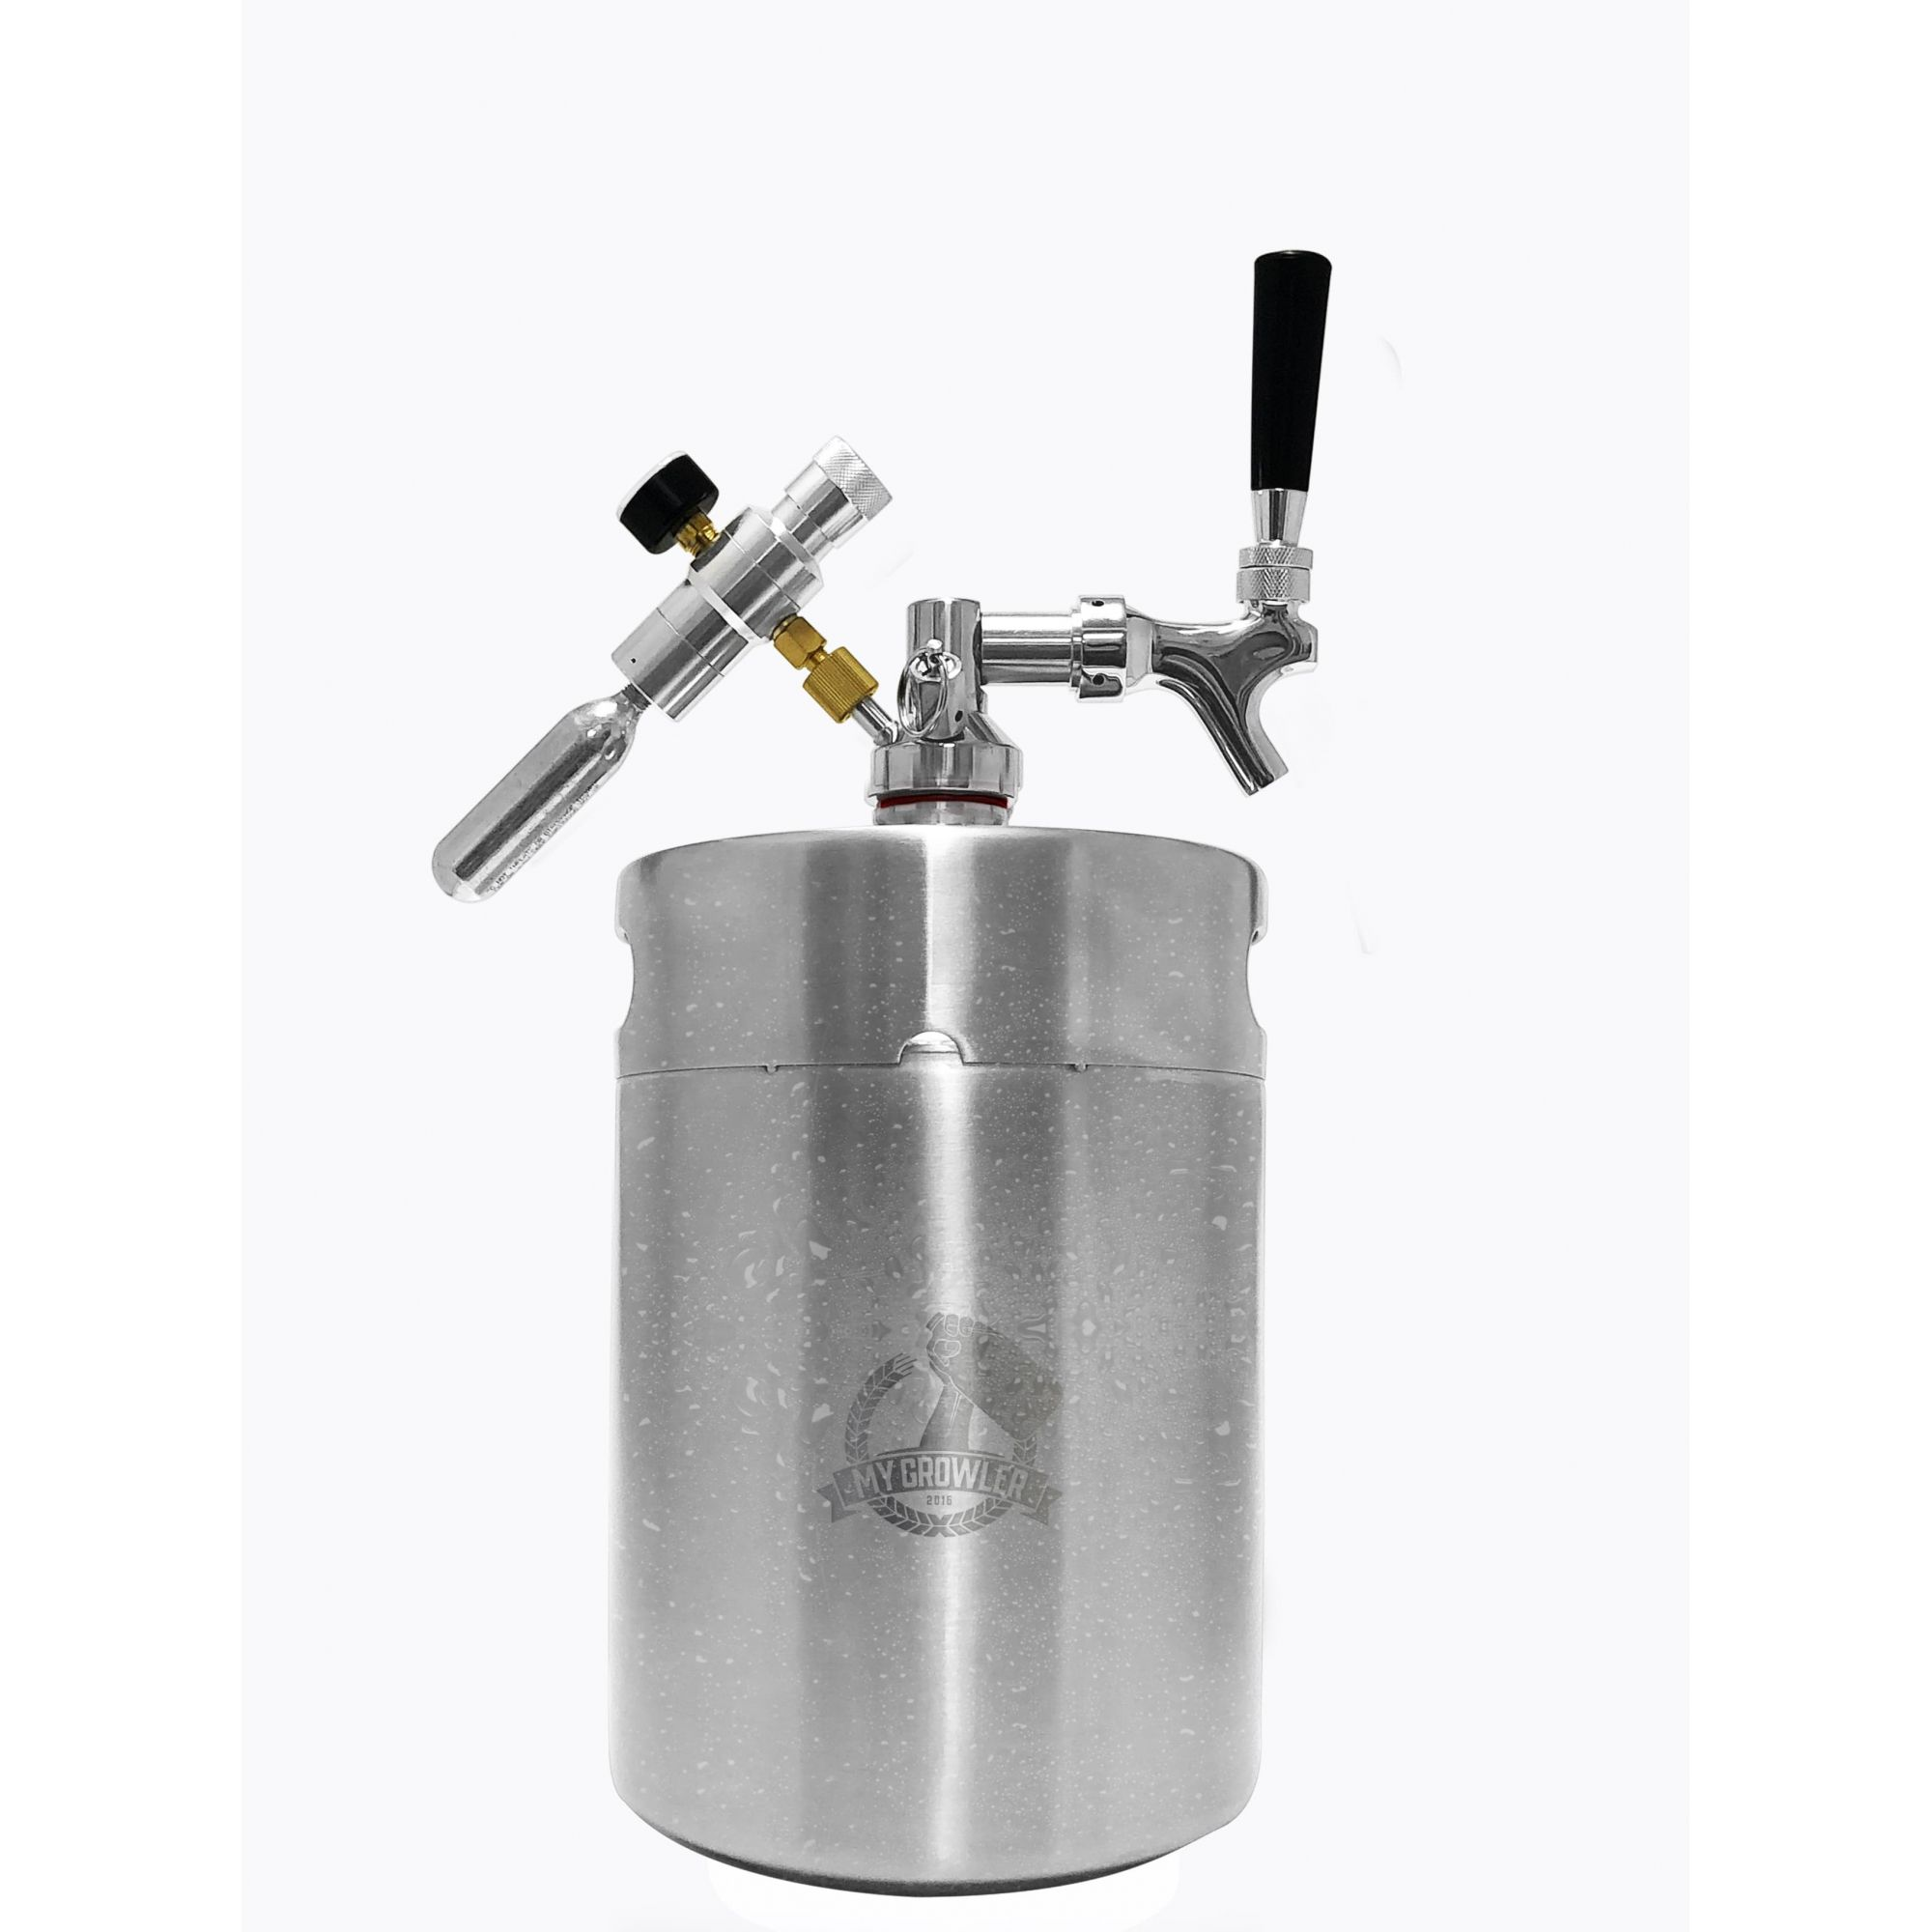 Kit My Keg, Growler Inox 5l com torneira americana Standard